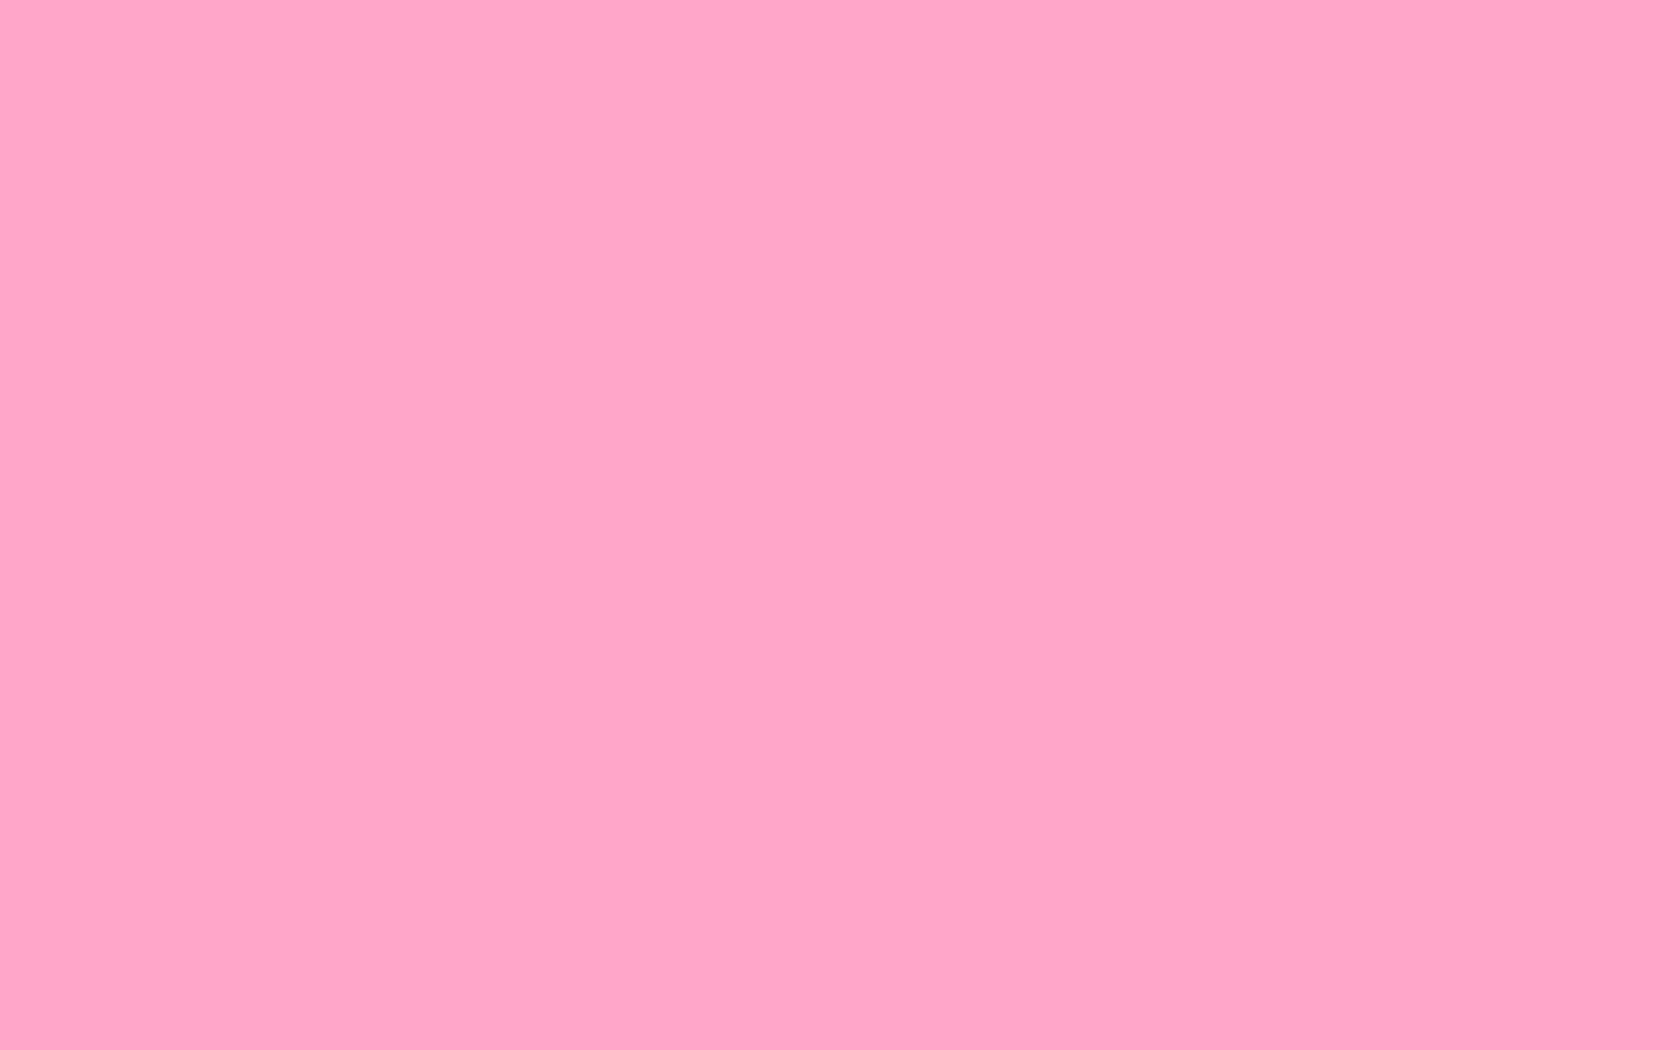 1680x1050 Carnation Pink Solid Color Background